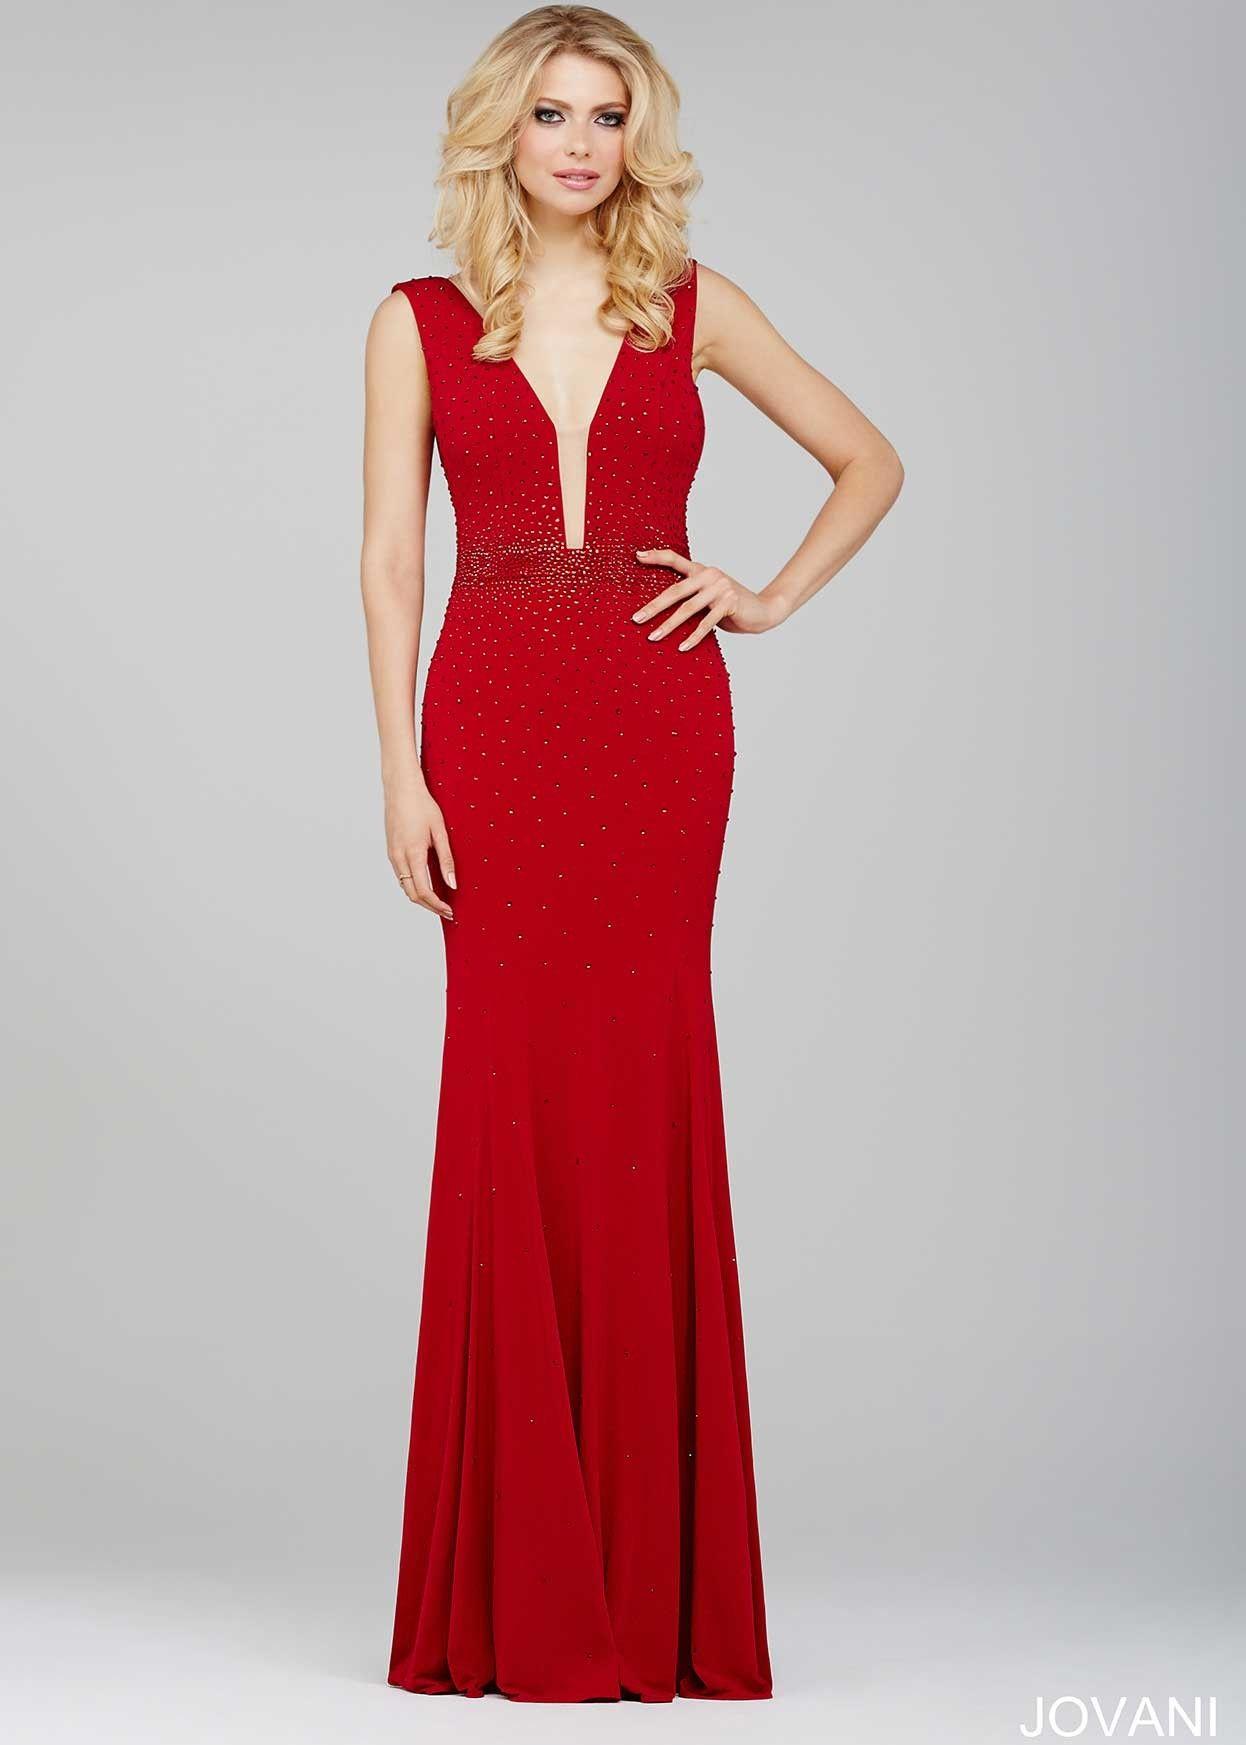 Jovani 32024 Red Ravishing Fit & Flare Jersey Prom Dress | 2016 ...